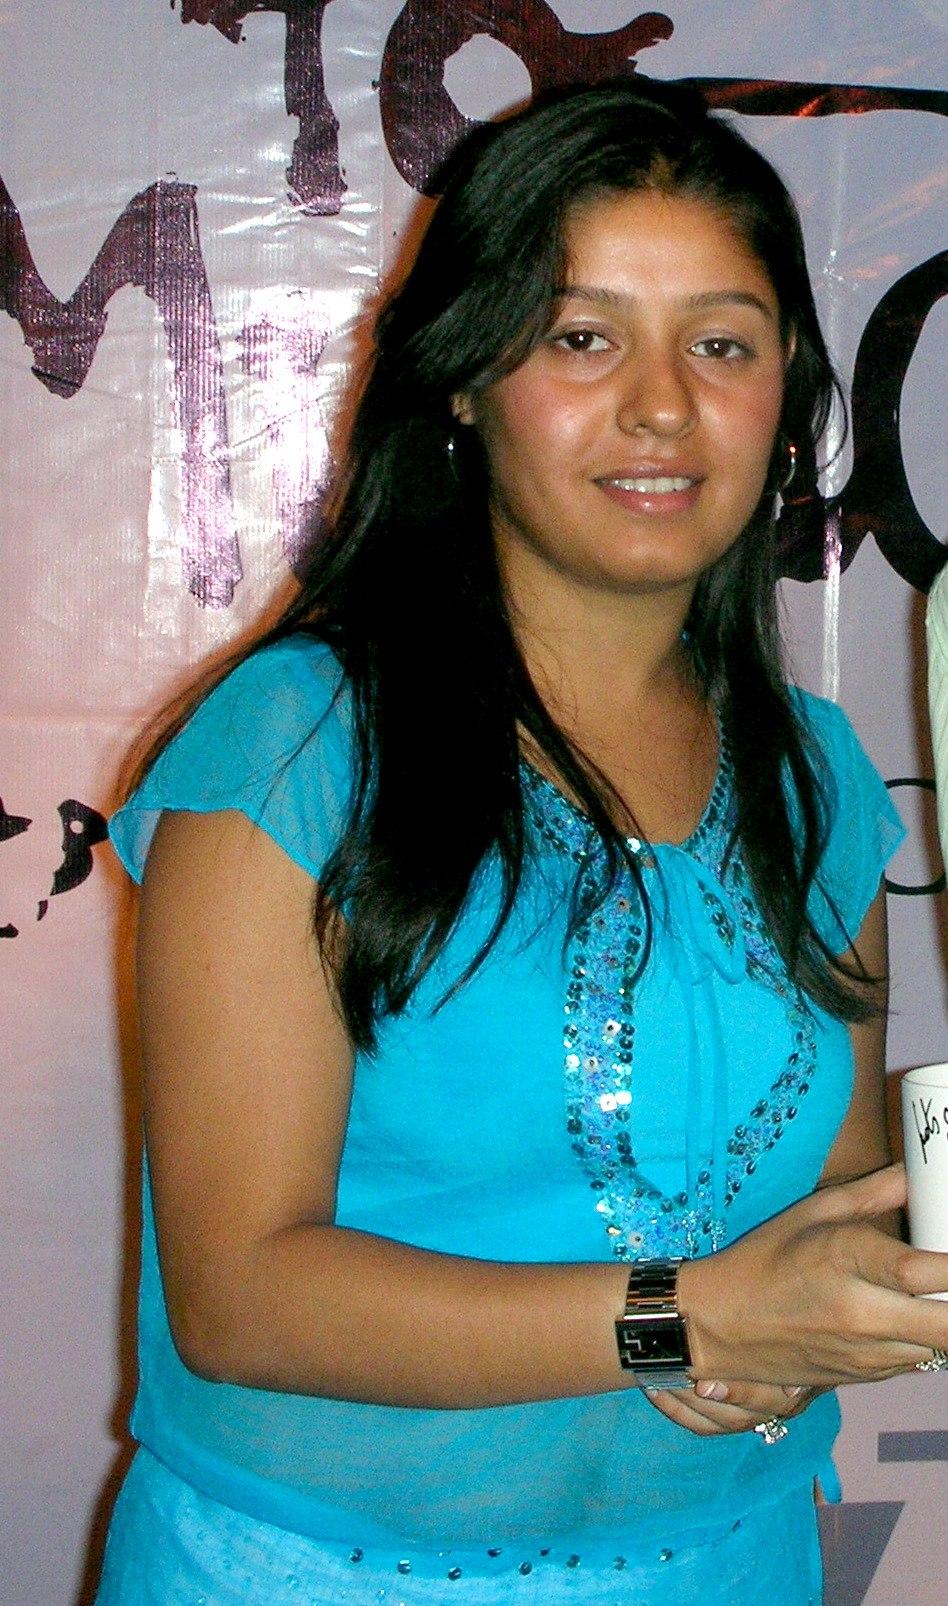 Sunidhi Chauhan smiling wearing a blue top